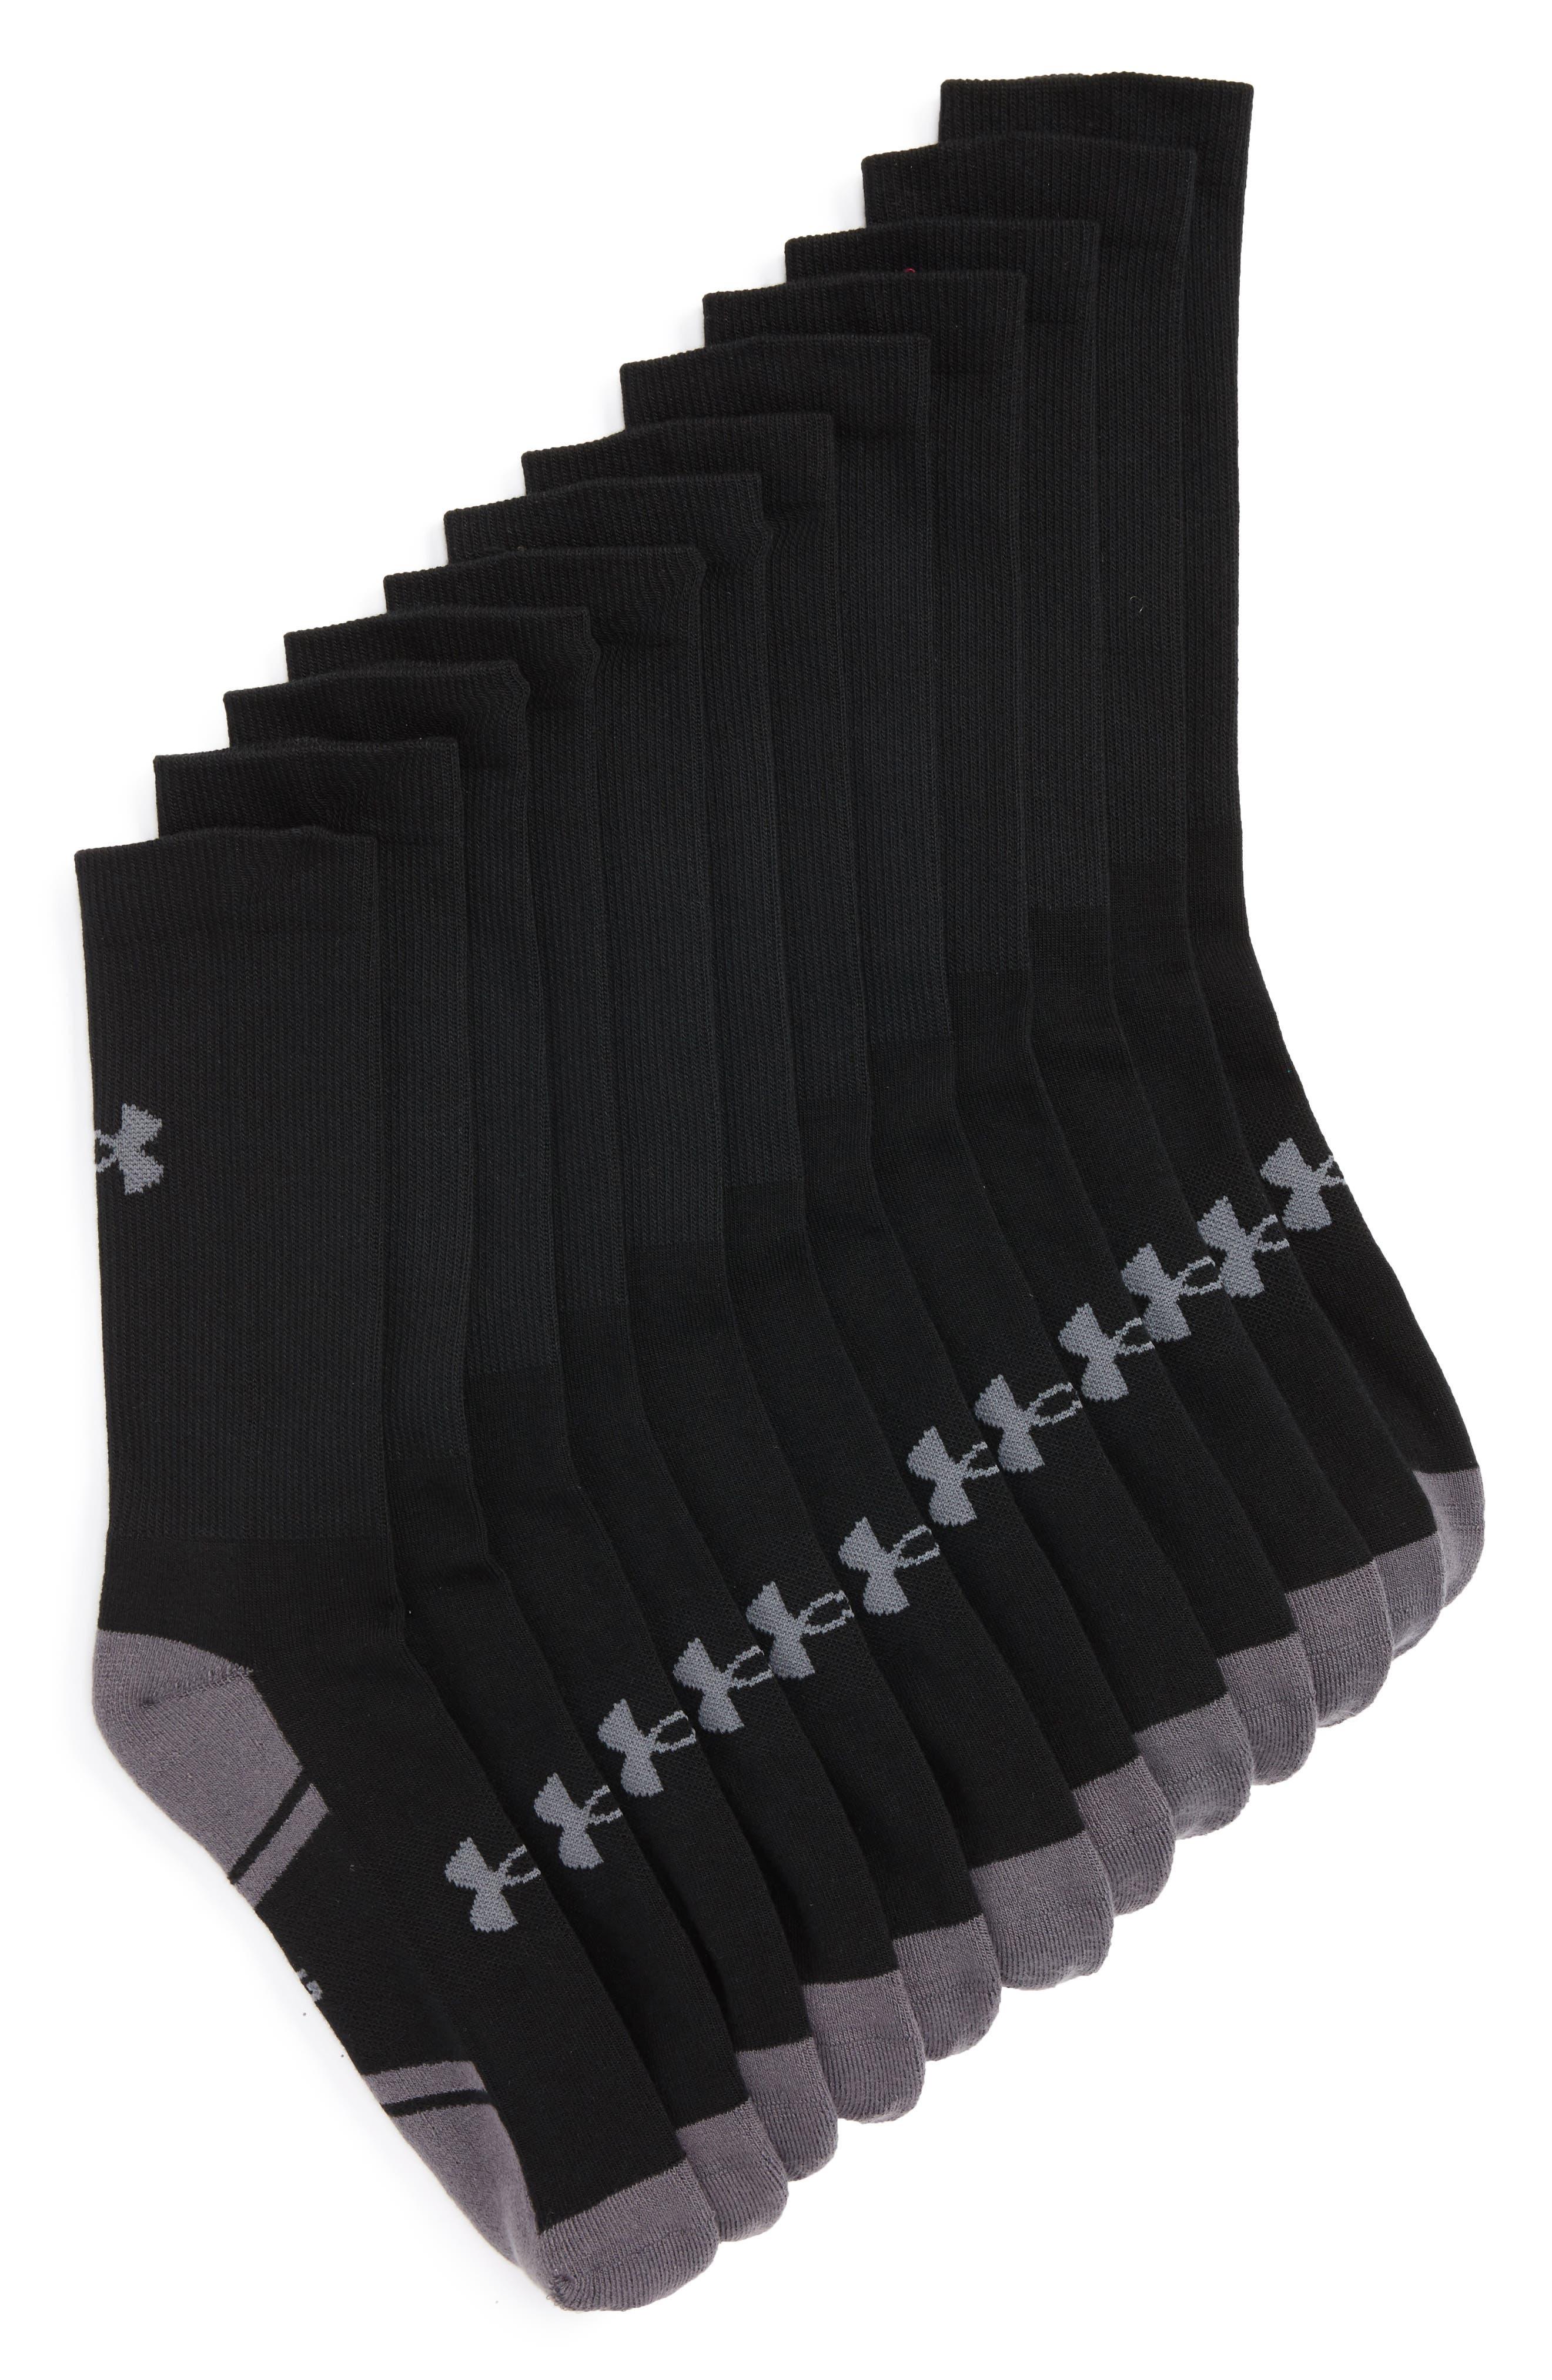 Under Armour Resistor 3.0 6-Pack Crew Socks